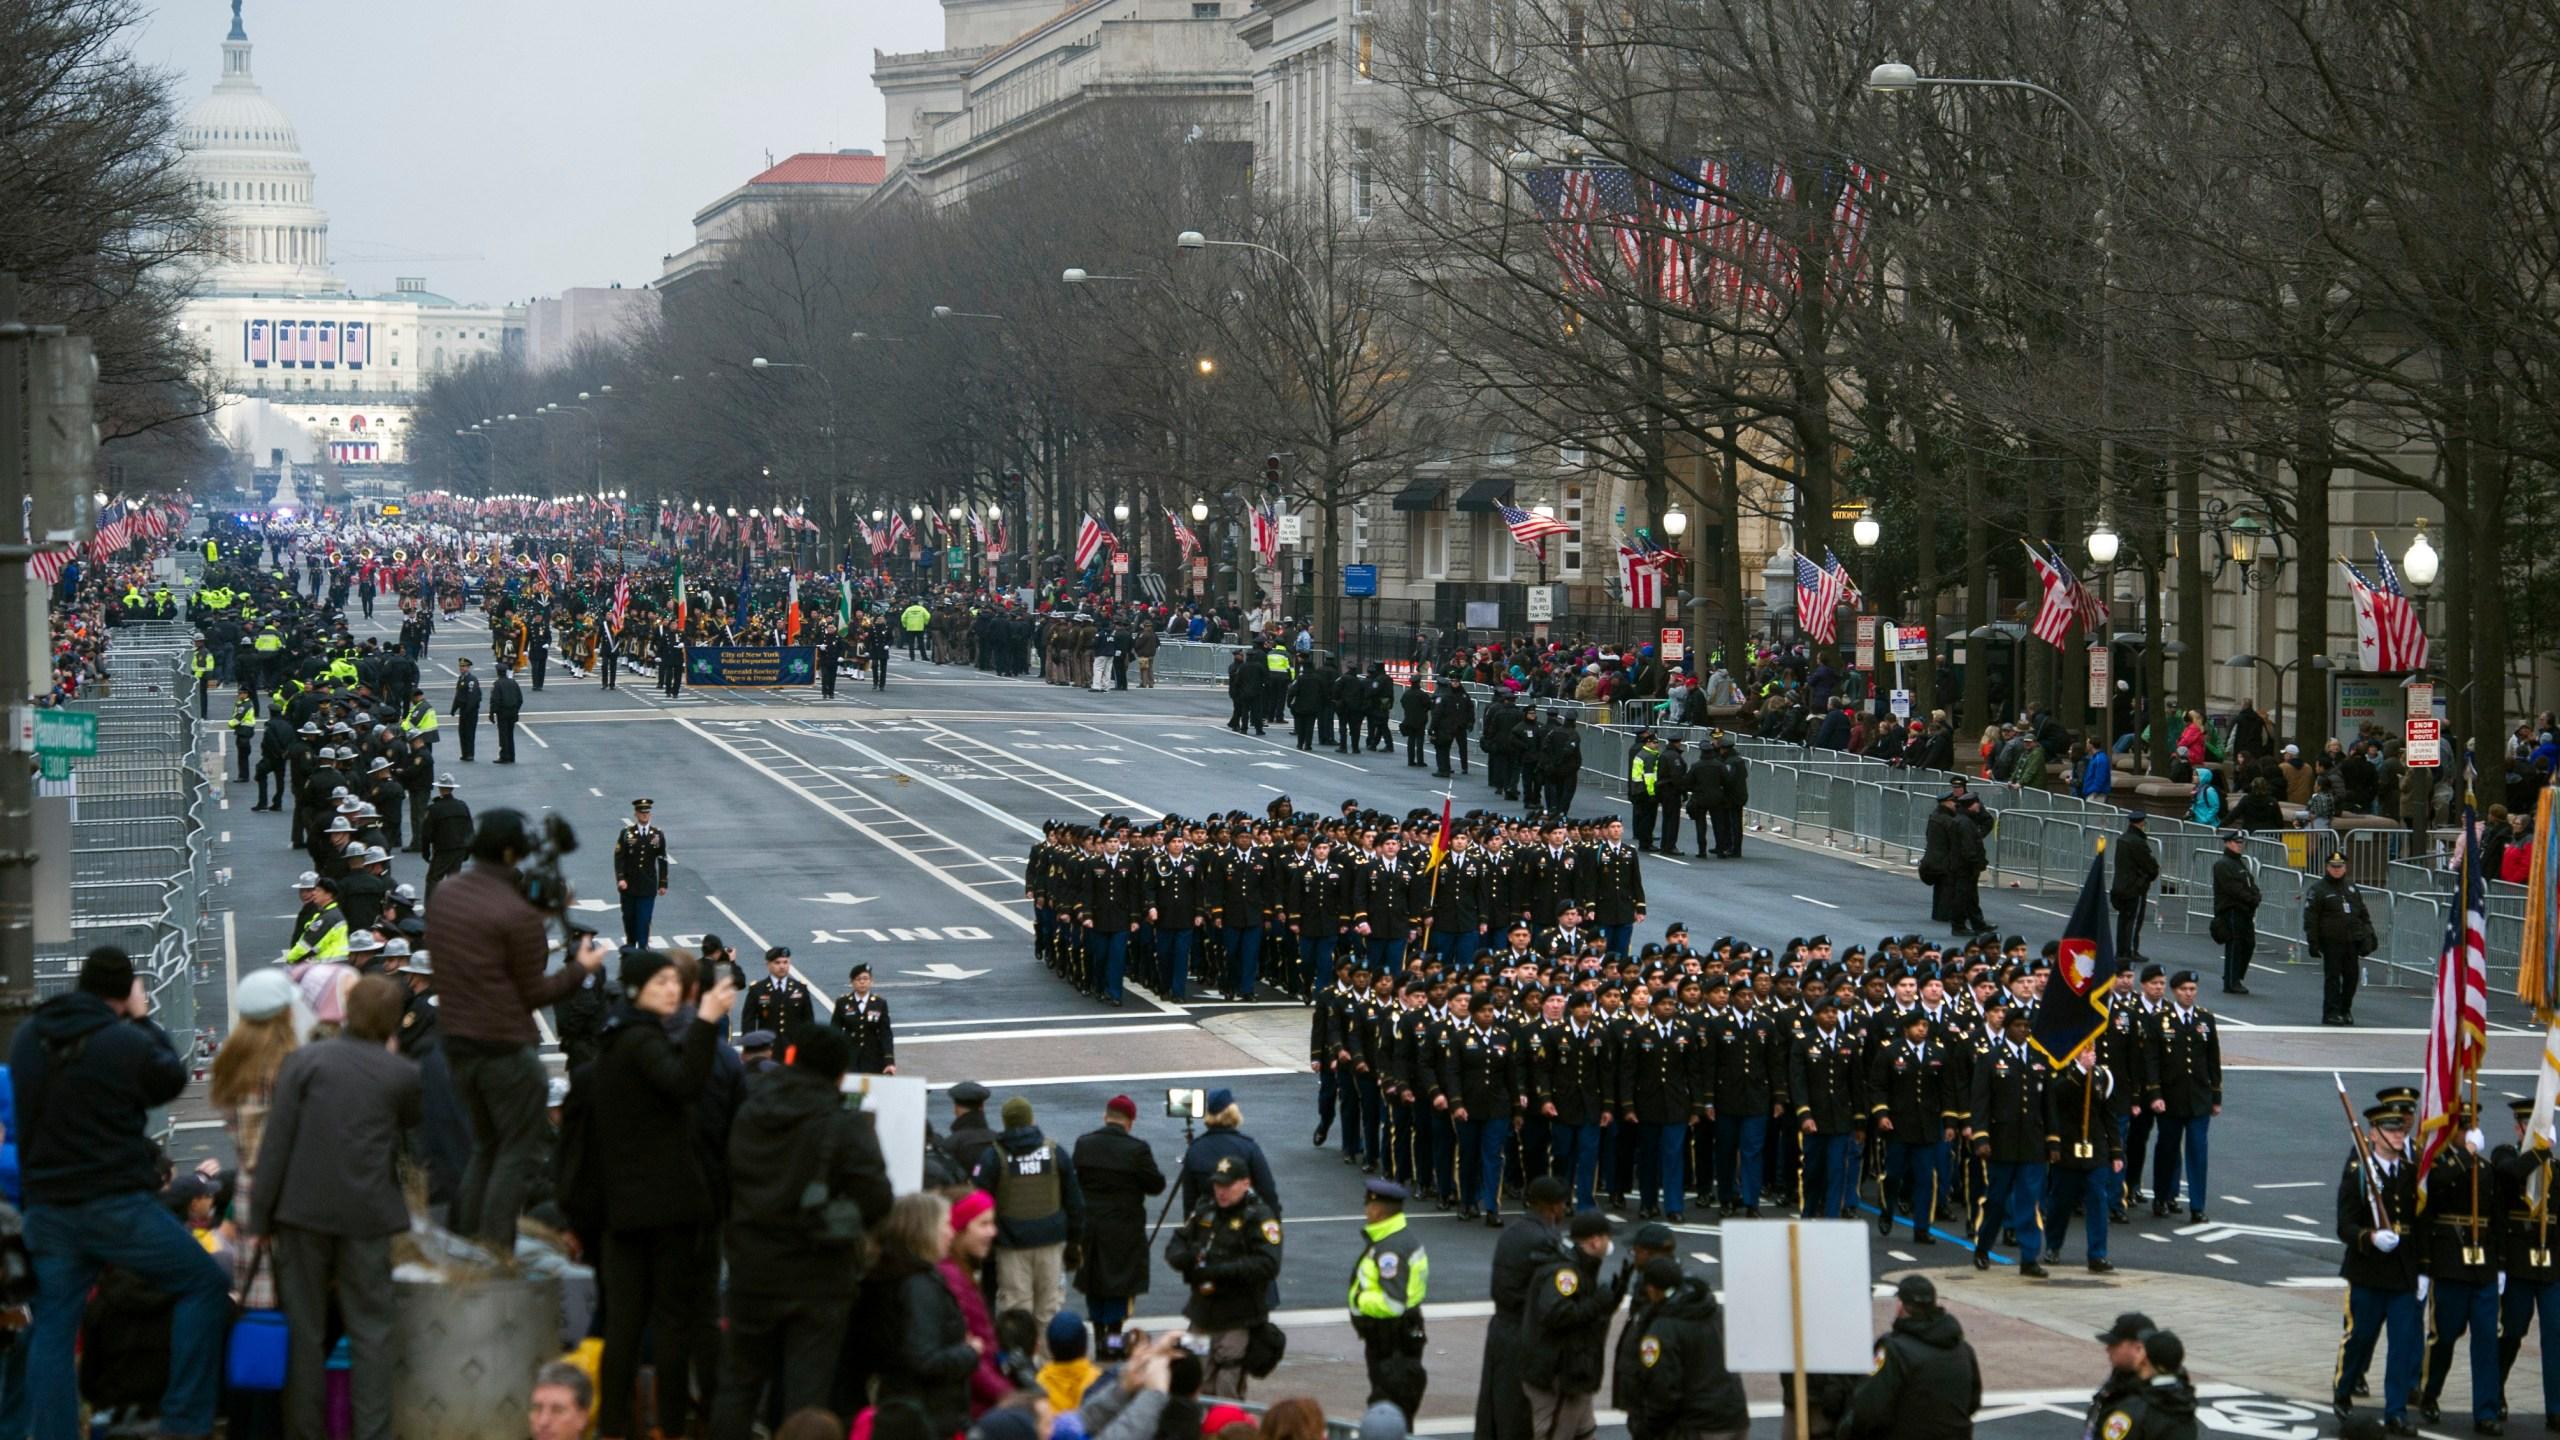 Military_Parade_54350-159532.jpg00338553